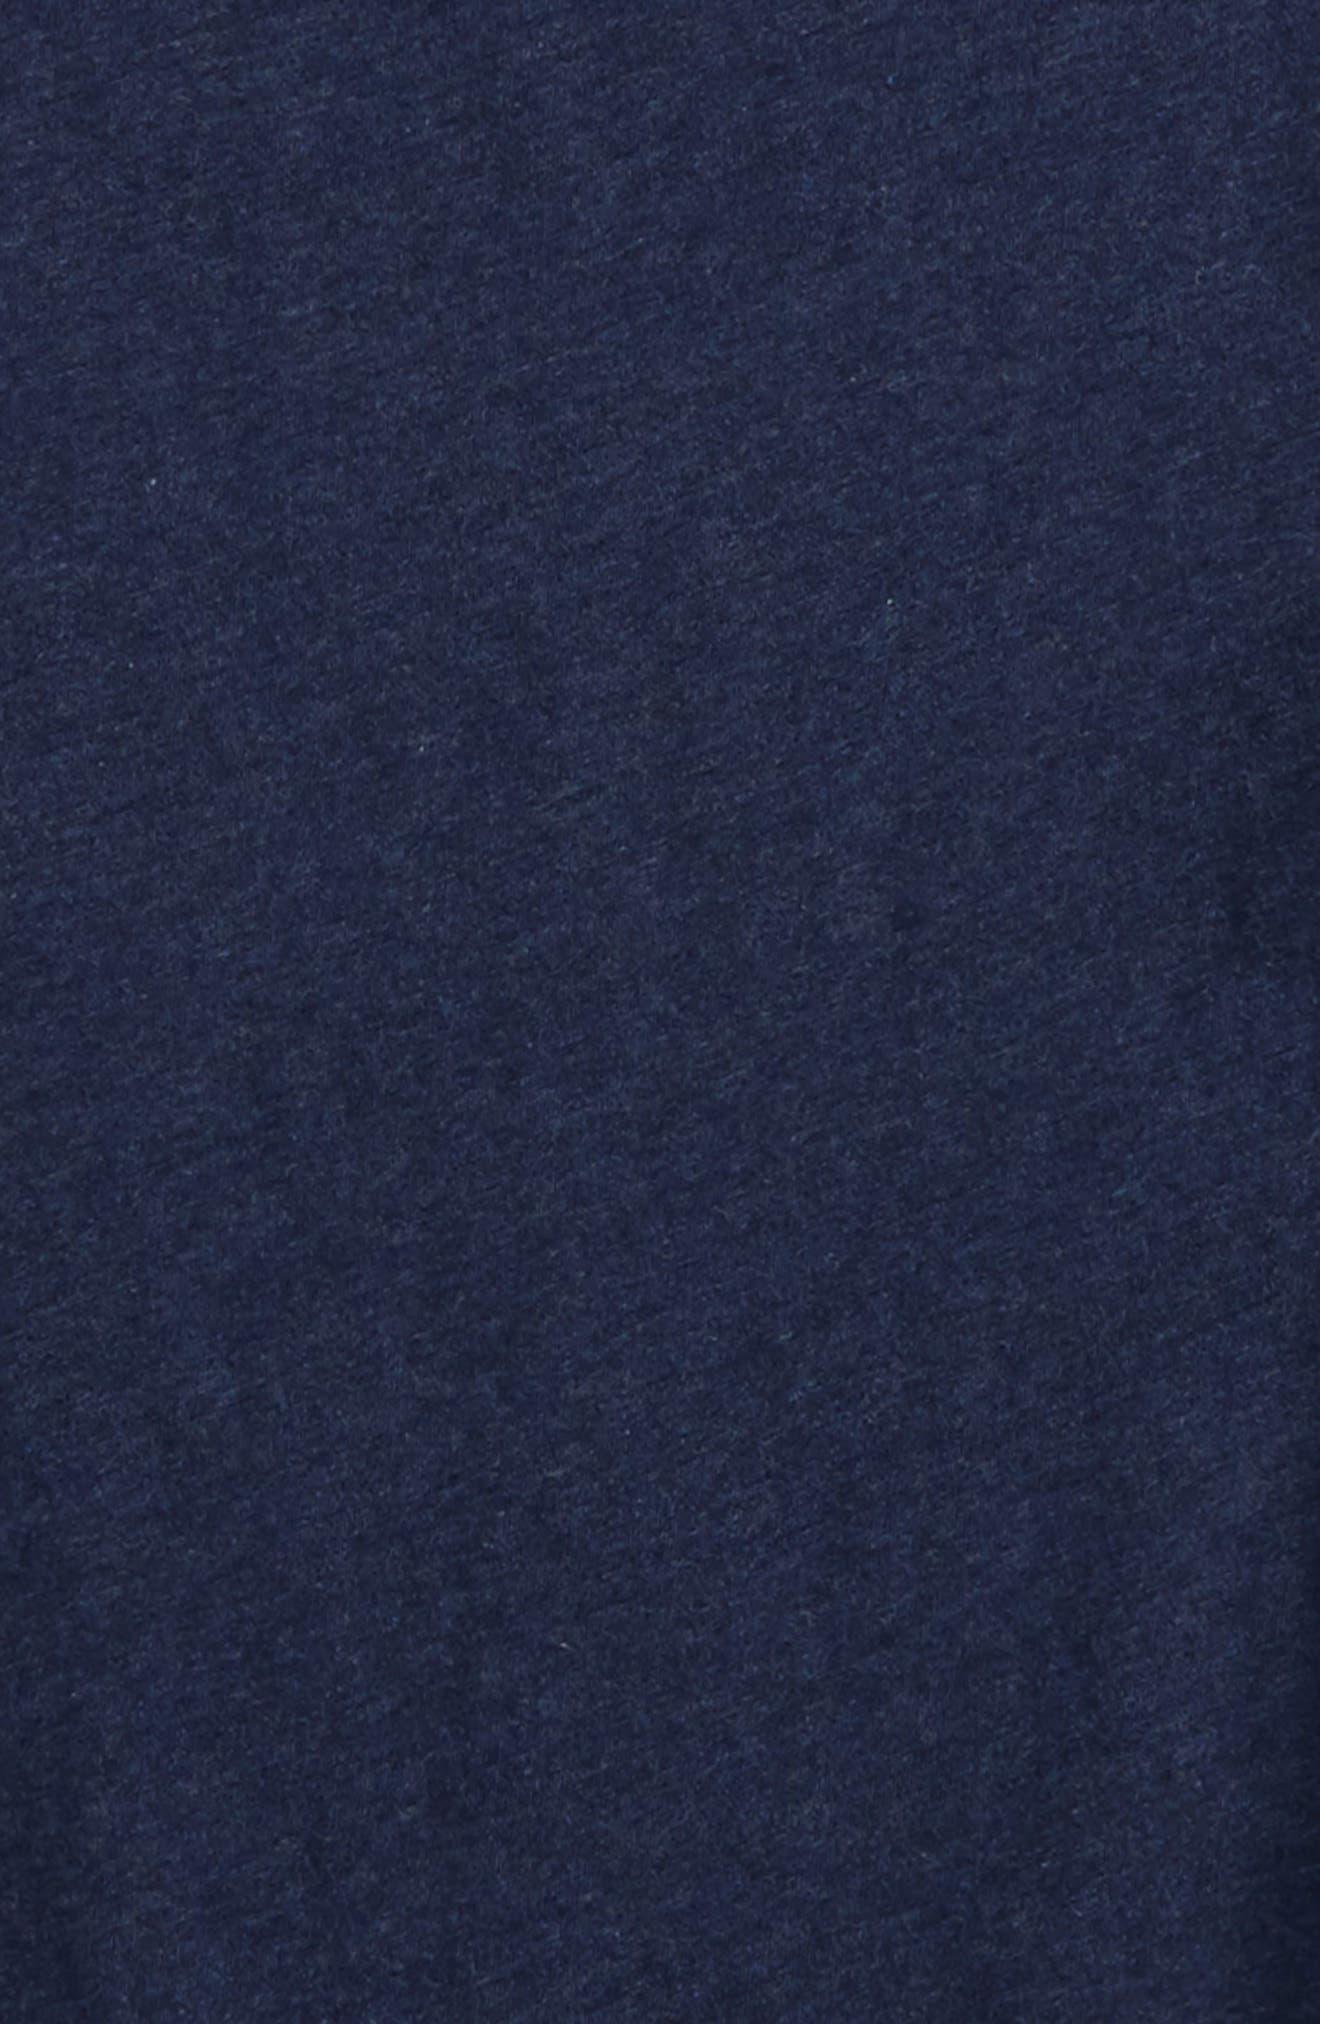 Woven Split Back Shirt,                             Alternate thumbnail 3, color,                             Navy Peacoat Heather